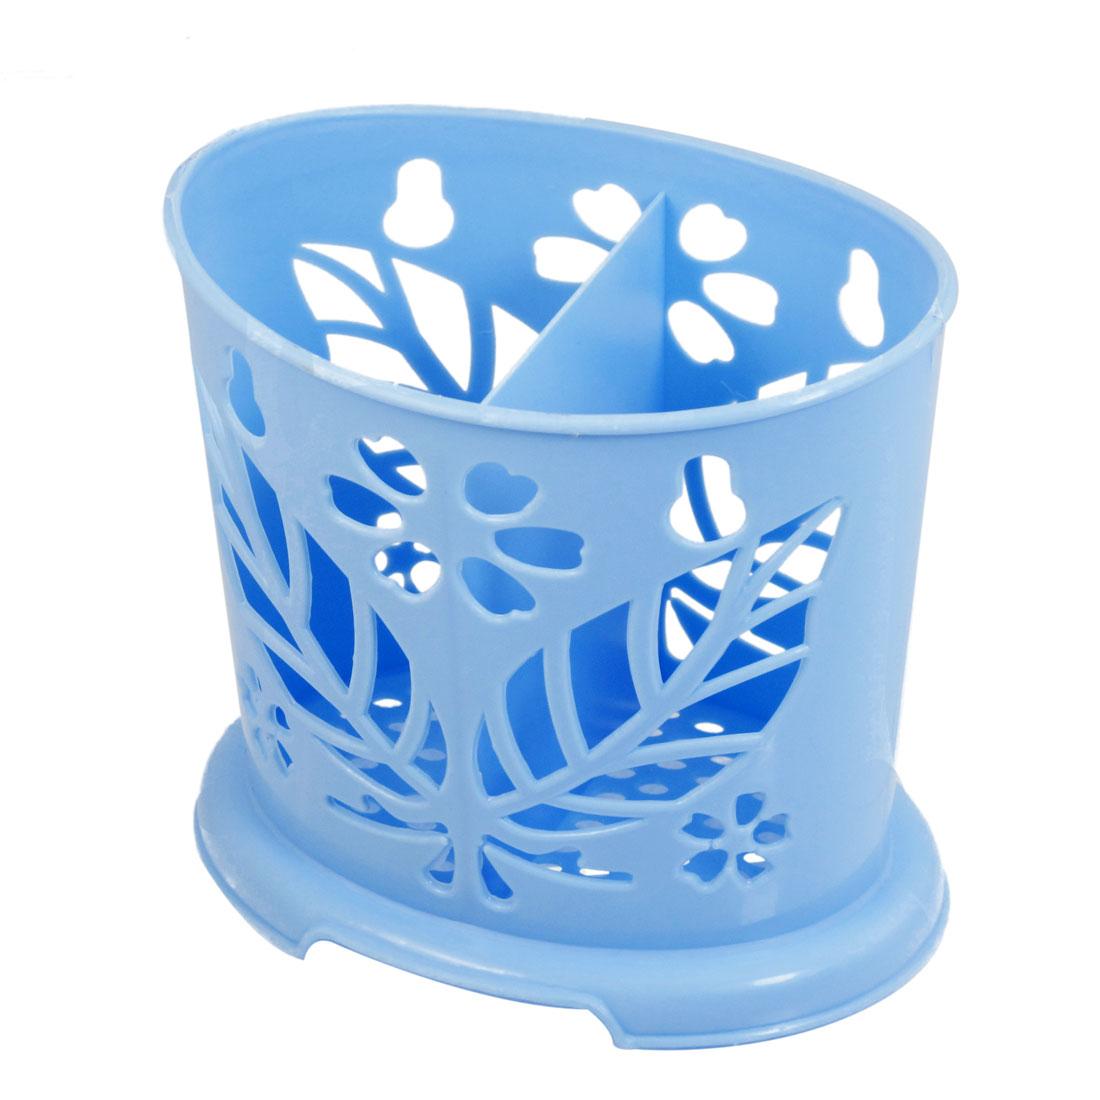 Kitchenware Blue Perforated Bottom Plastic Chopstick Holder Case